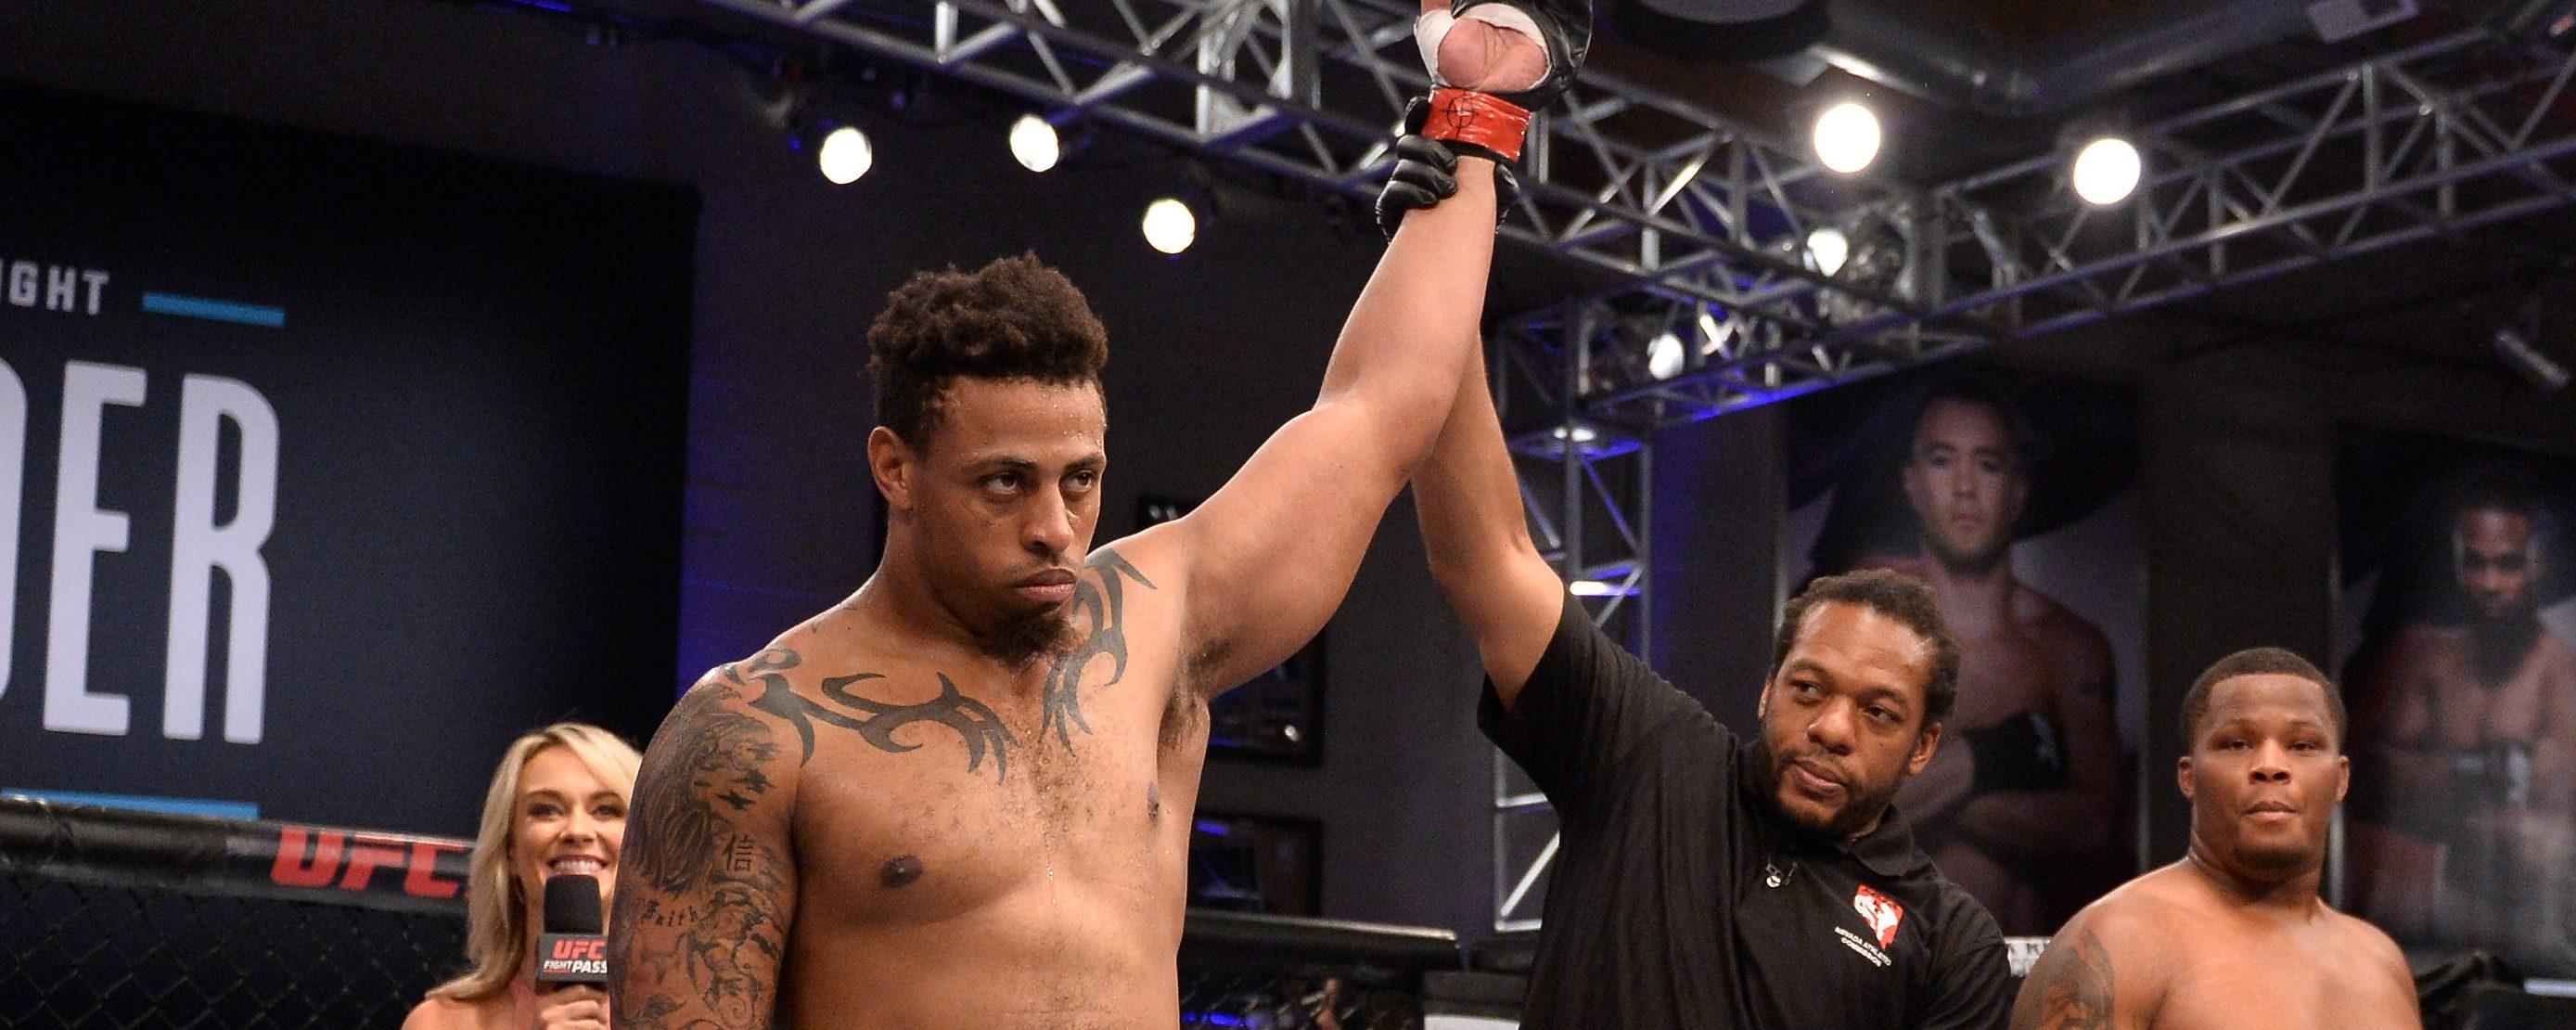 UFC Made Big Mistake Putting Greg Hardy on Same Card as Domestic Abuse Survivor